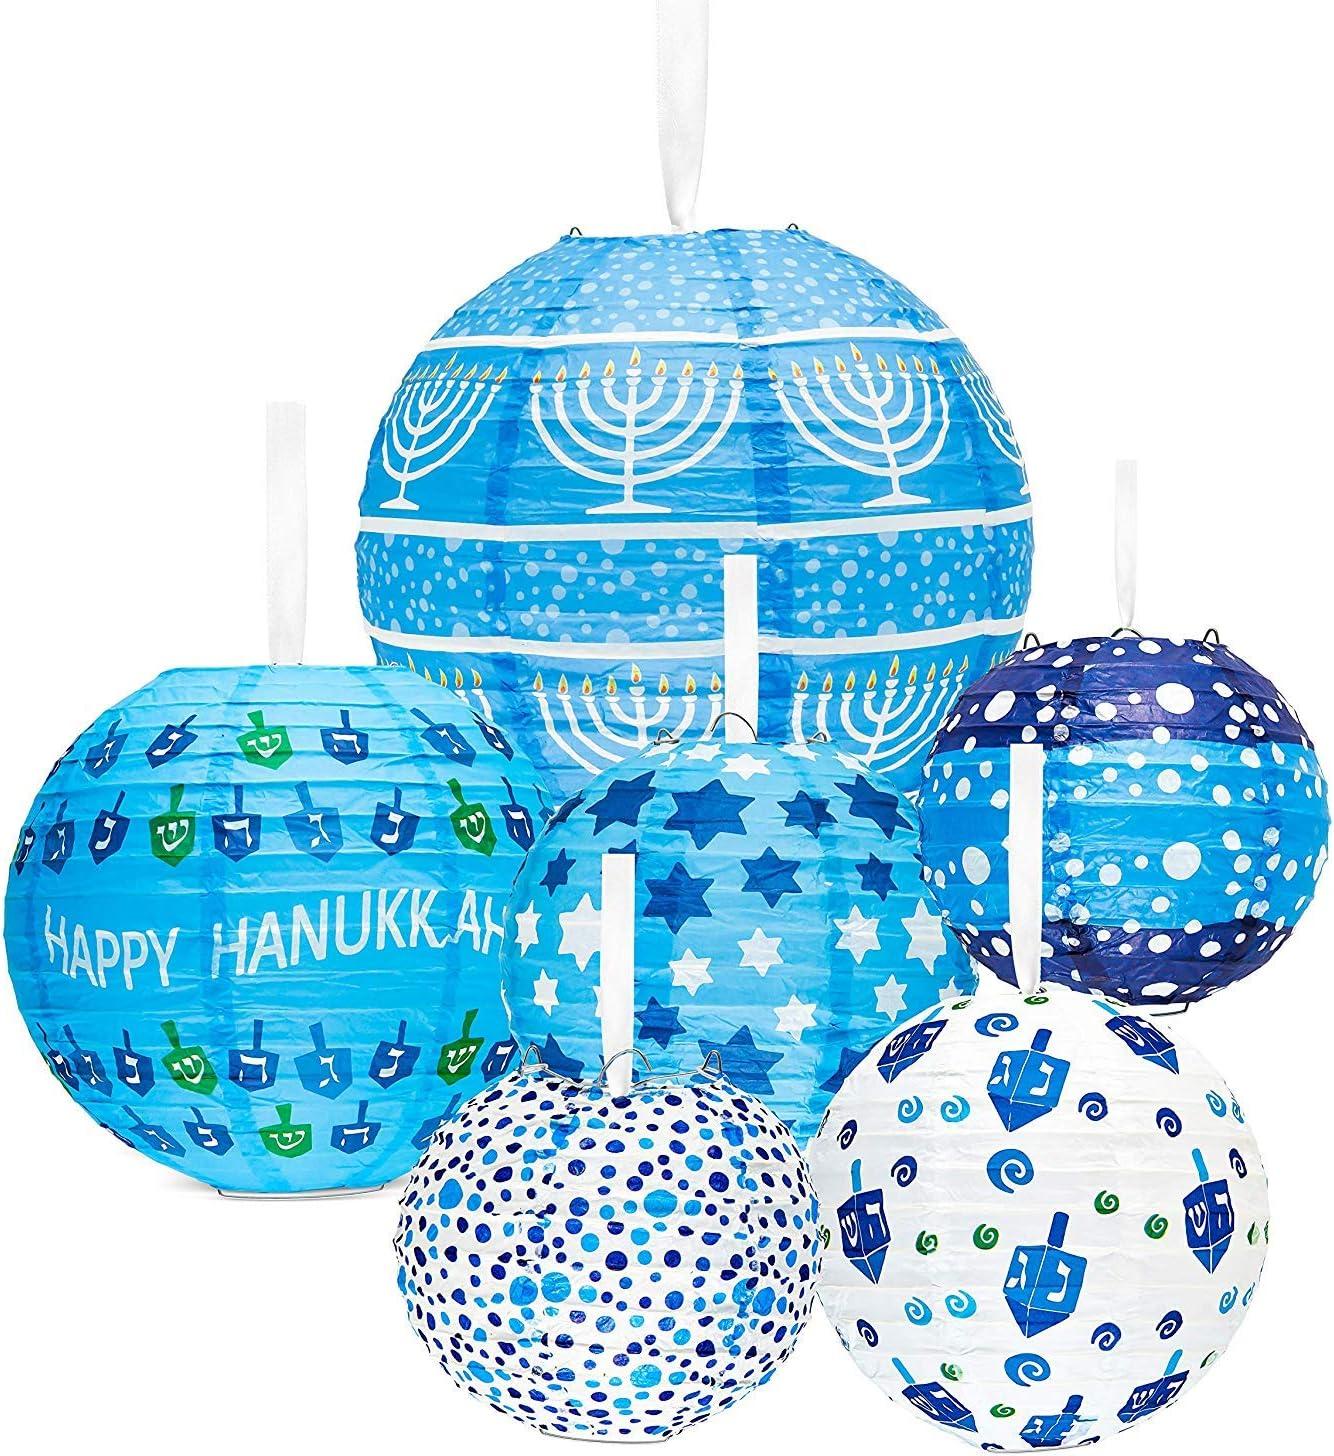 Hanukkah Hanging Ball Lanterns Ornaments (6-Pack) - Hanukkah Decorations!